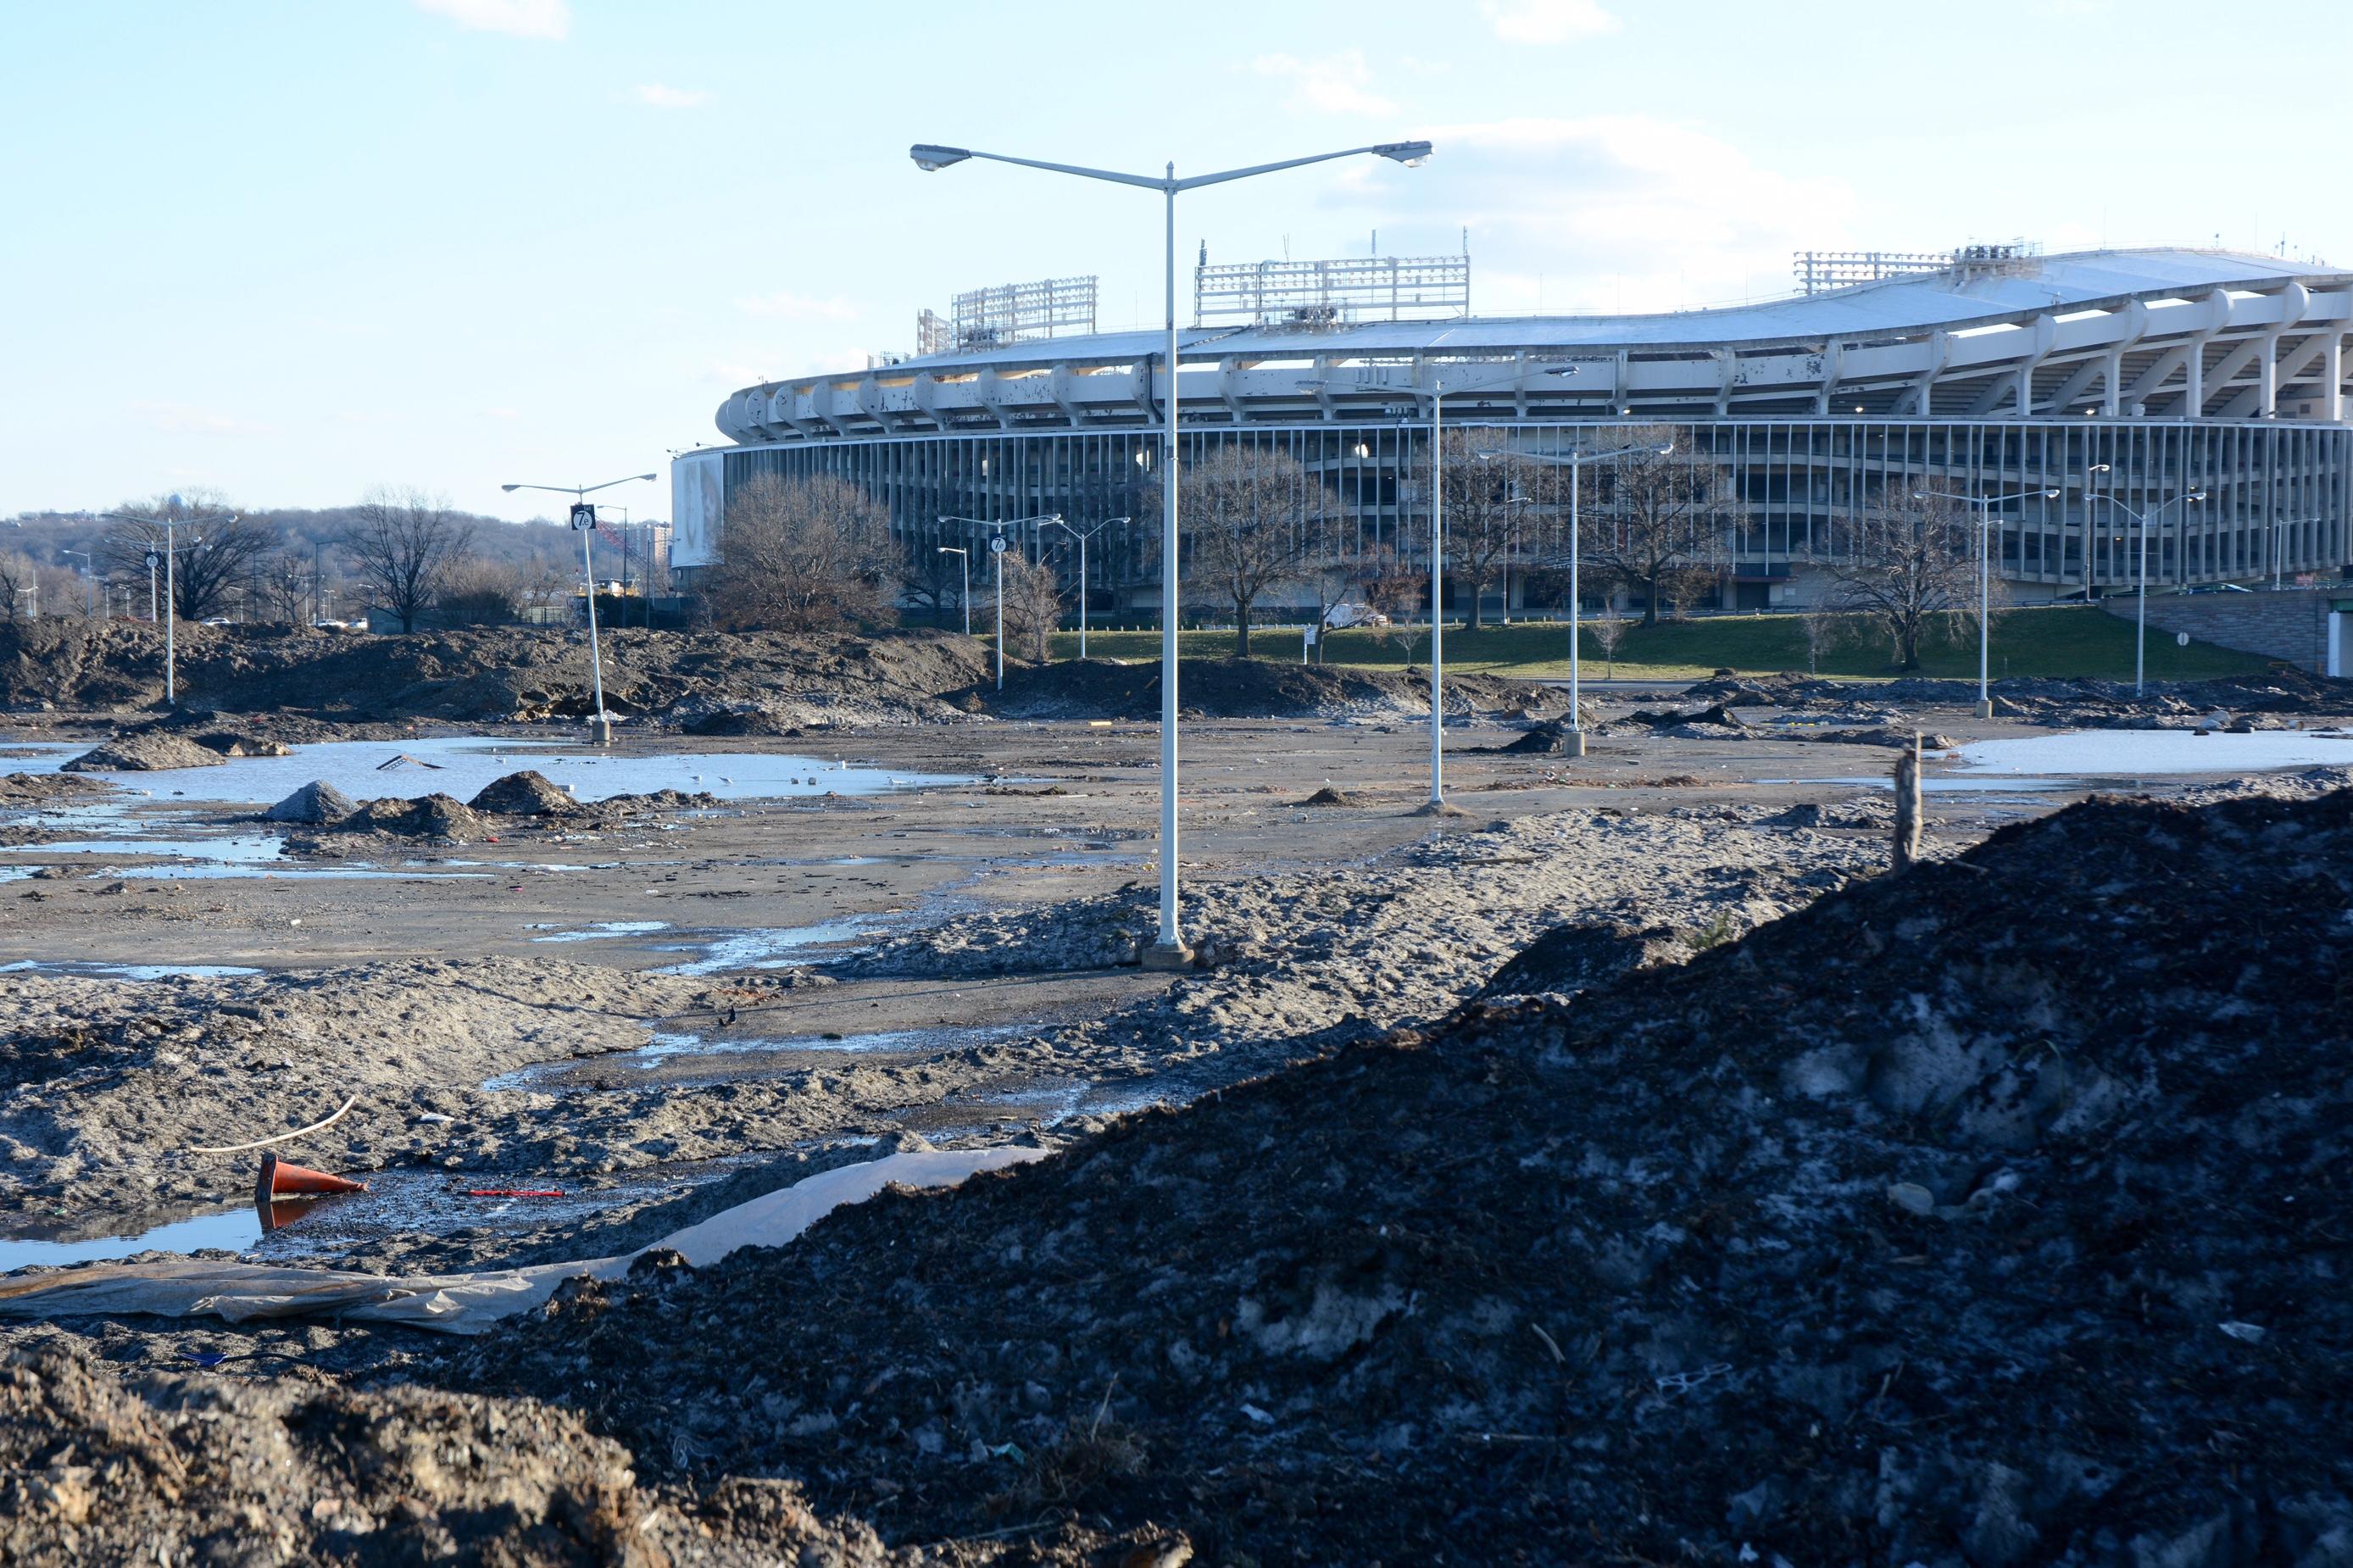 Blizzard's remnants linger at RFK Stadium